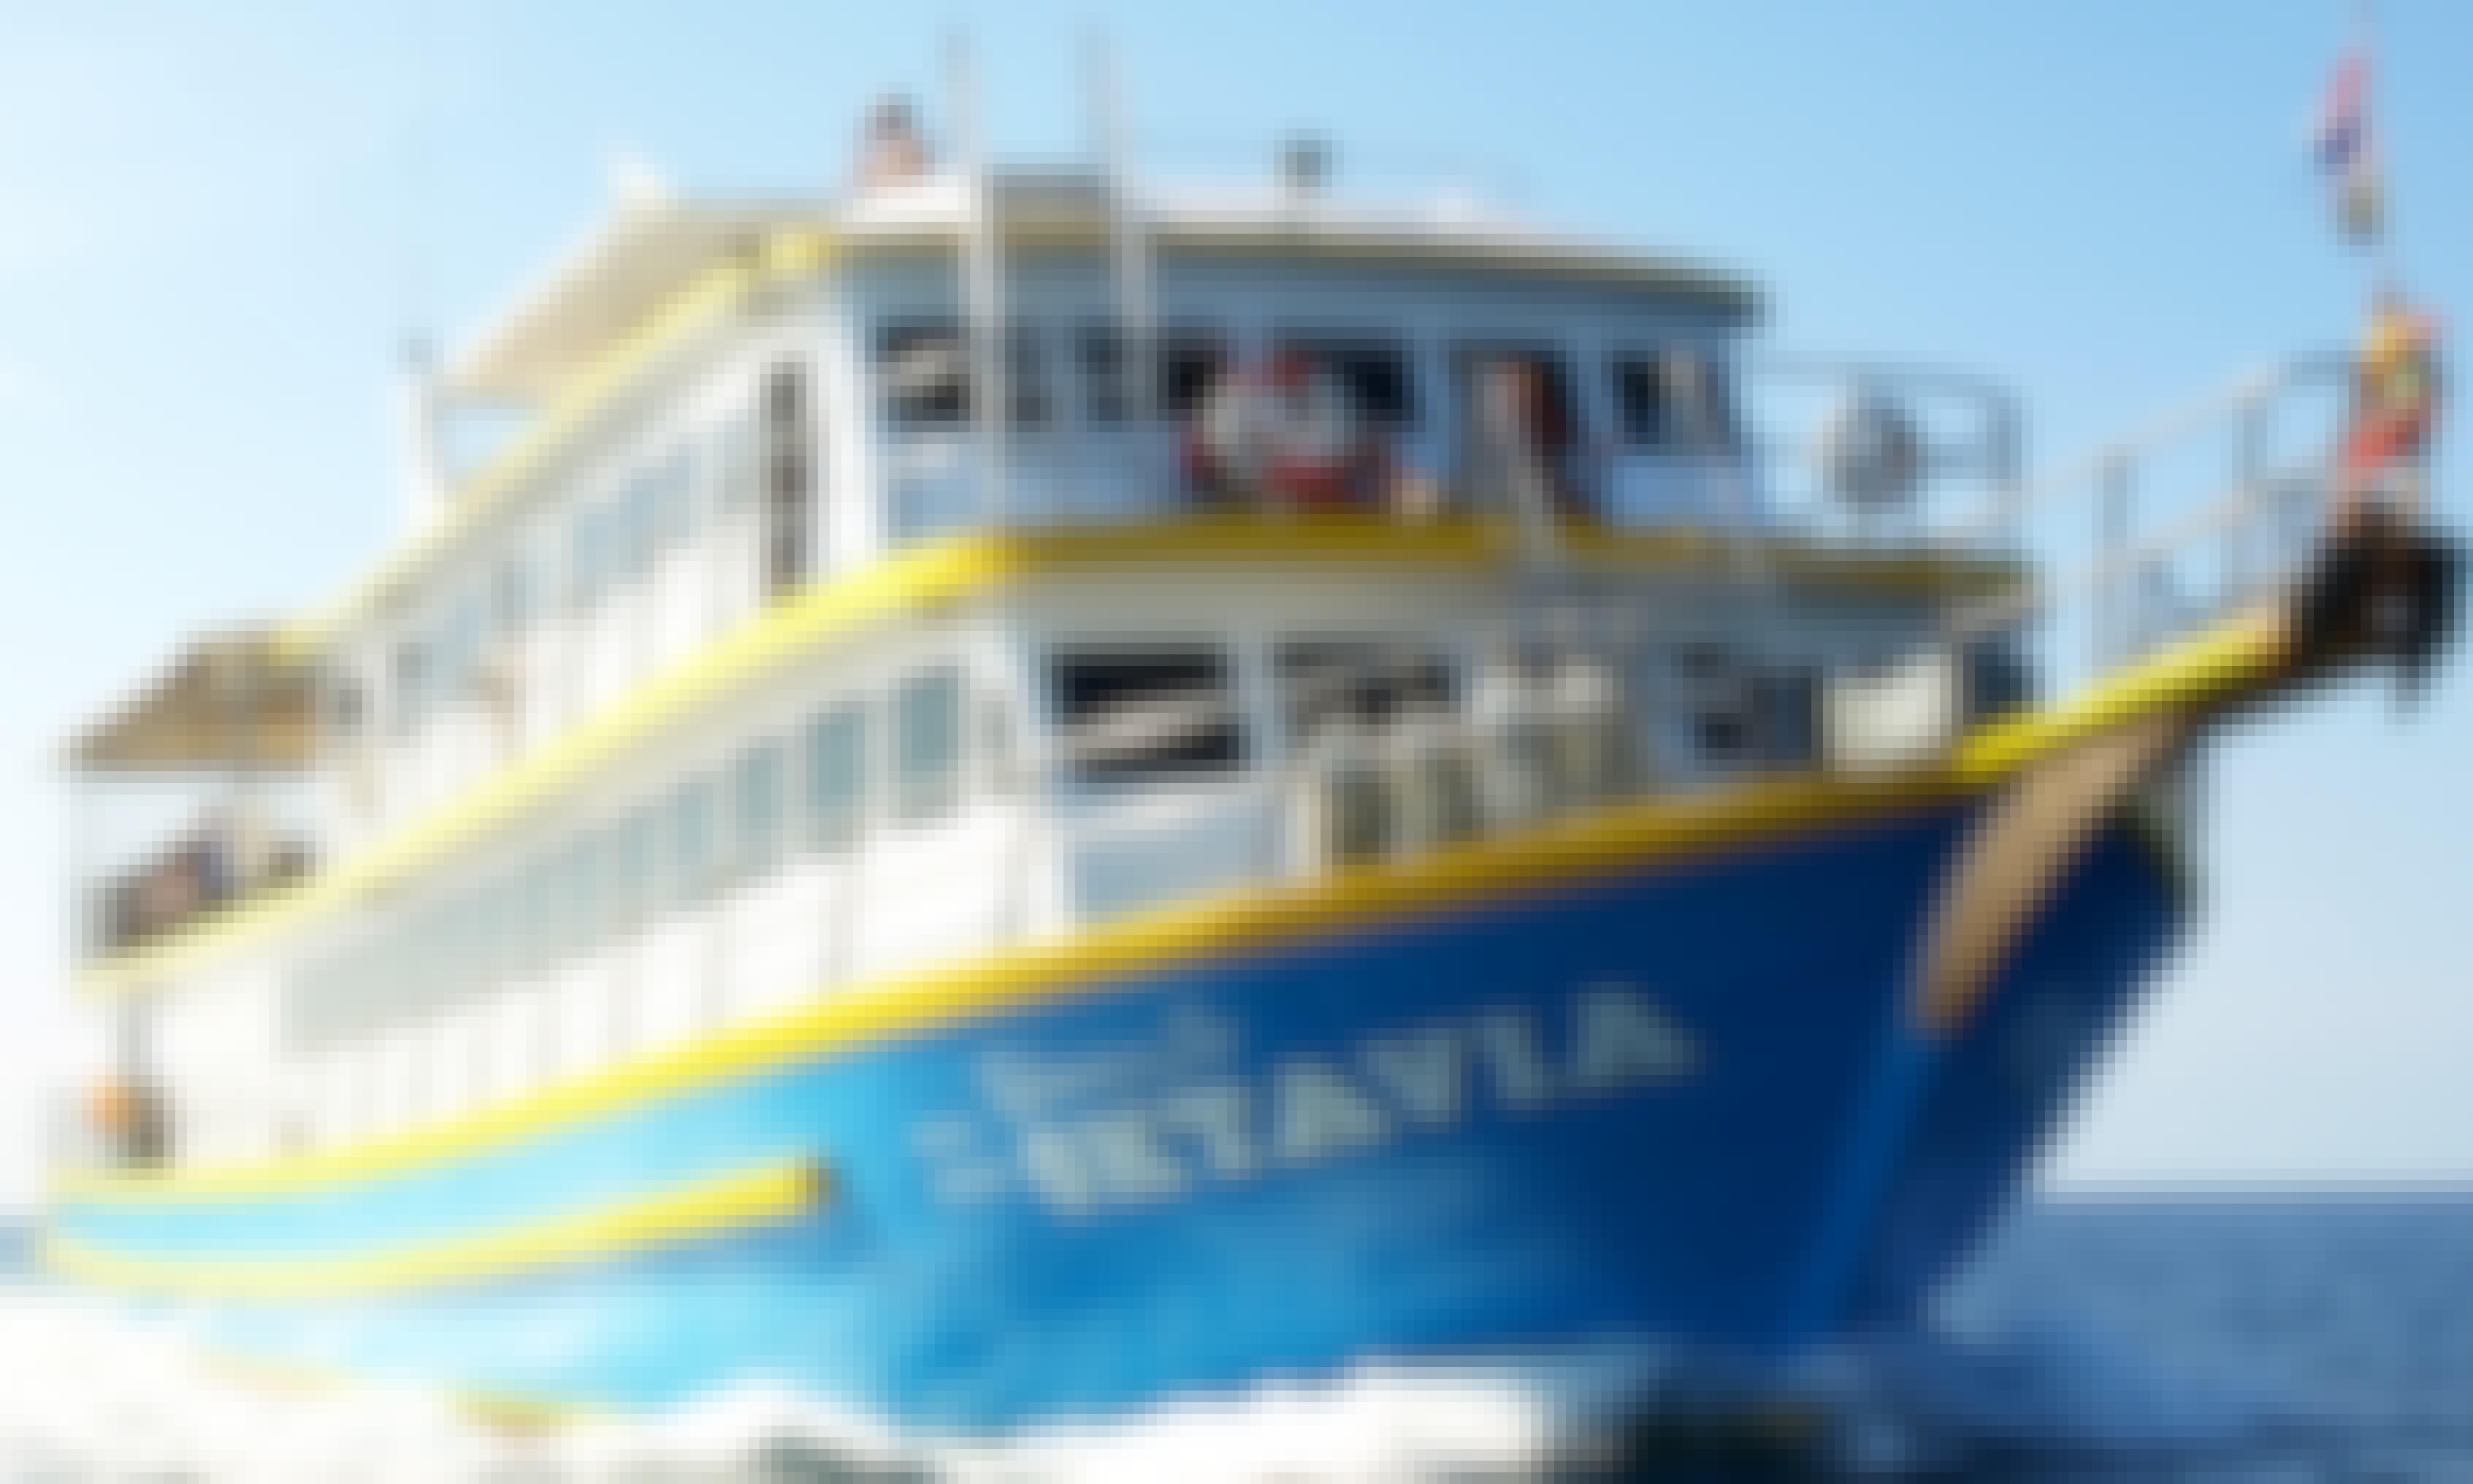 MV Oktavia - Similan Islands Scuba Diving Liveaboard